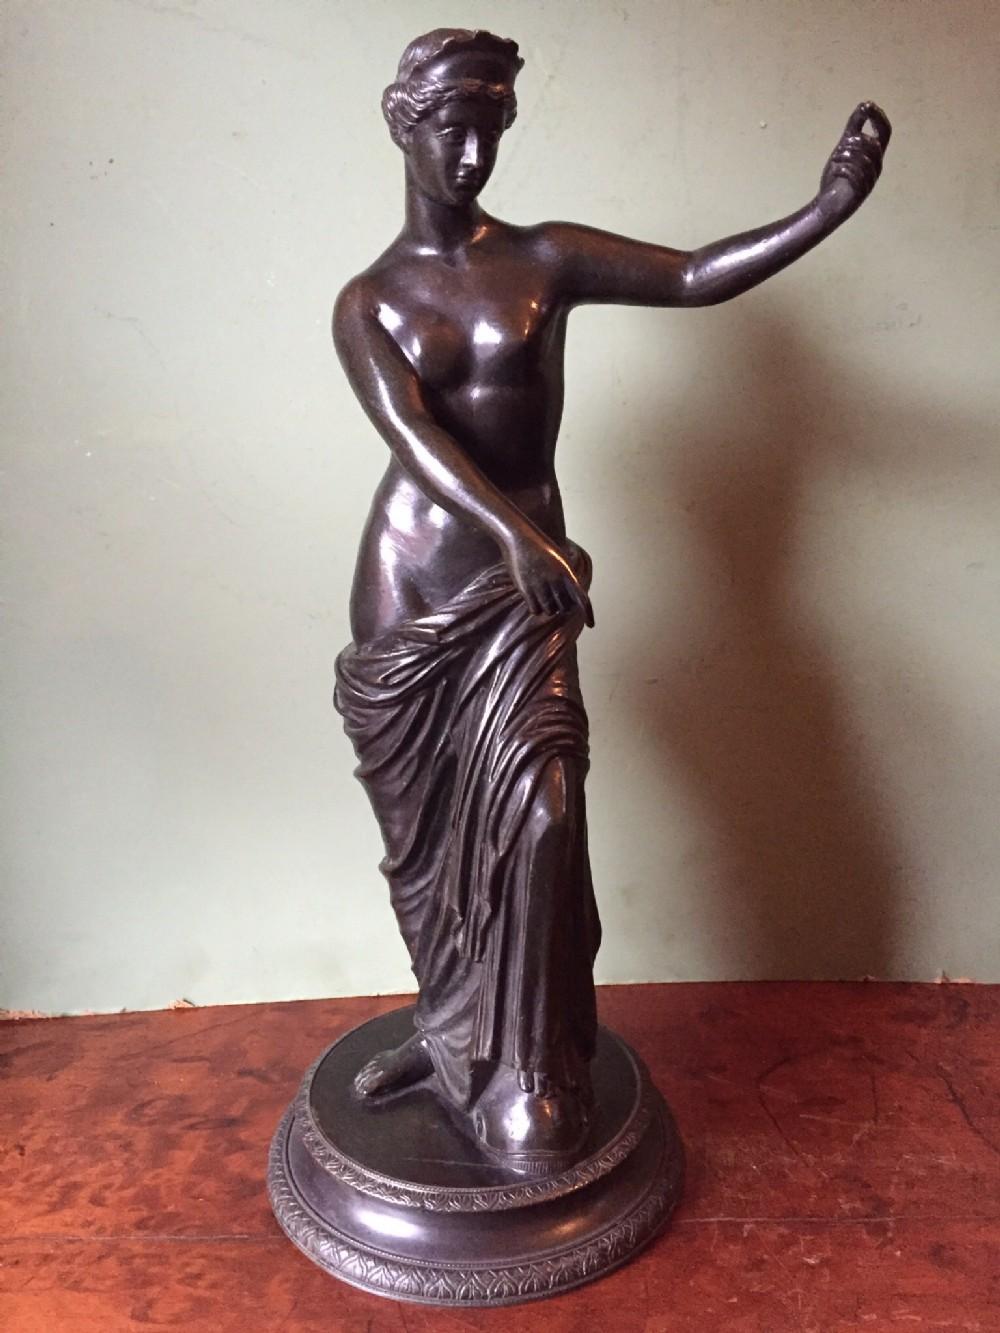 late c19th 'grand tour' souvenir bronze statue after the antique venus of capua